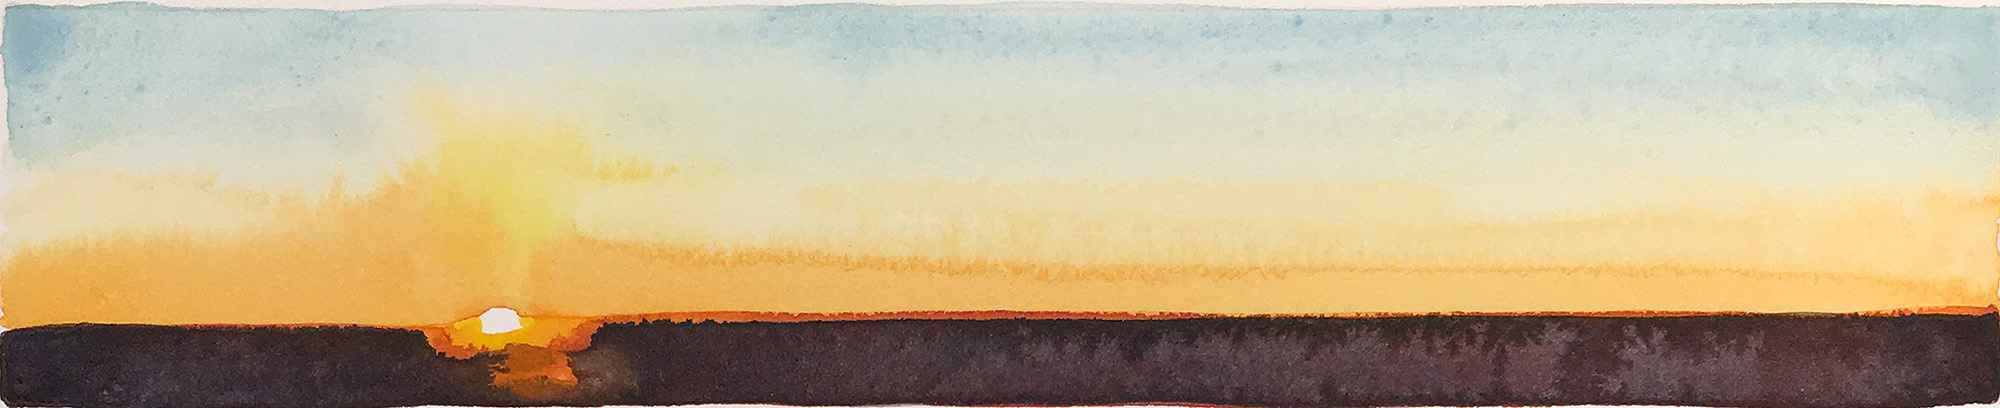 Morning Turn II by  Lisa Grossman - Masterpiece Online